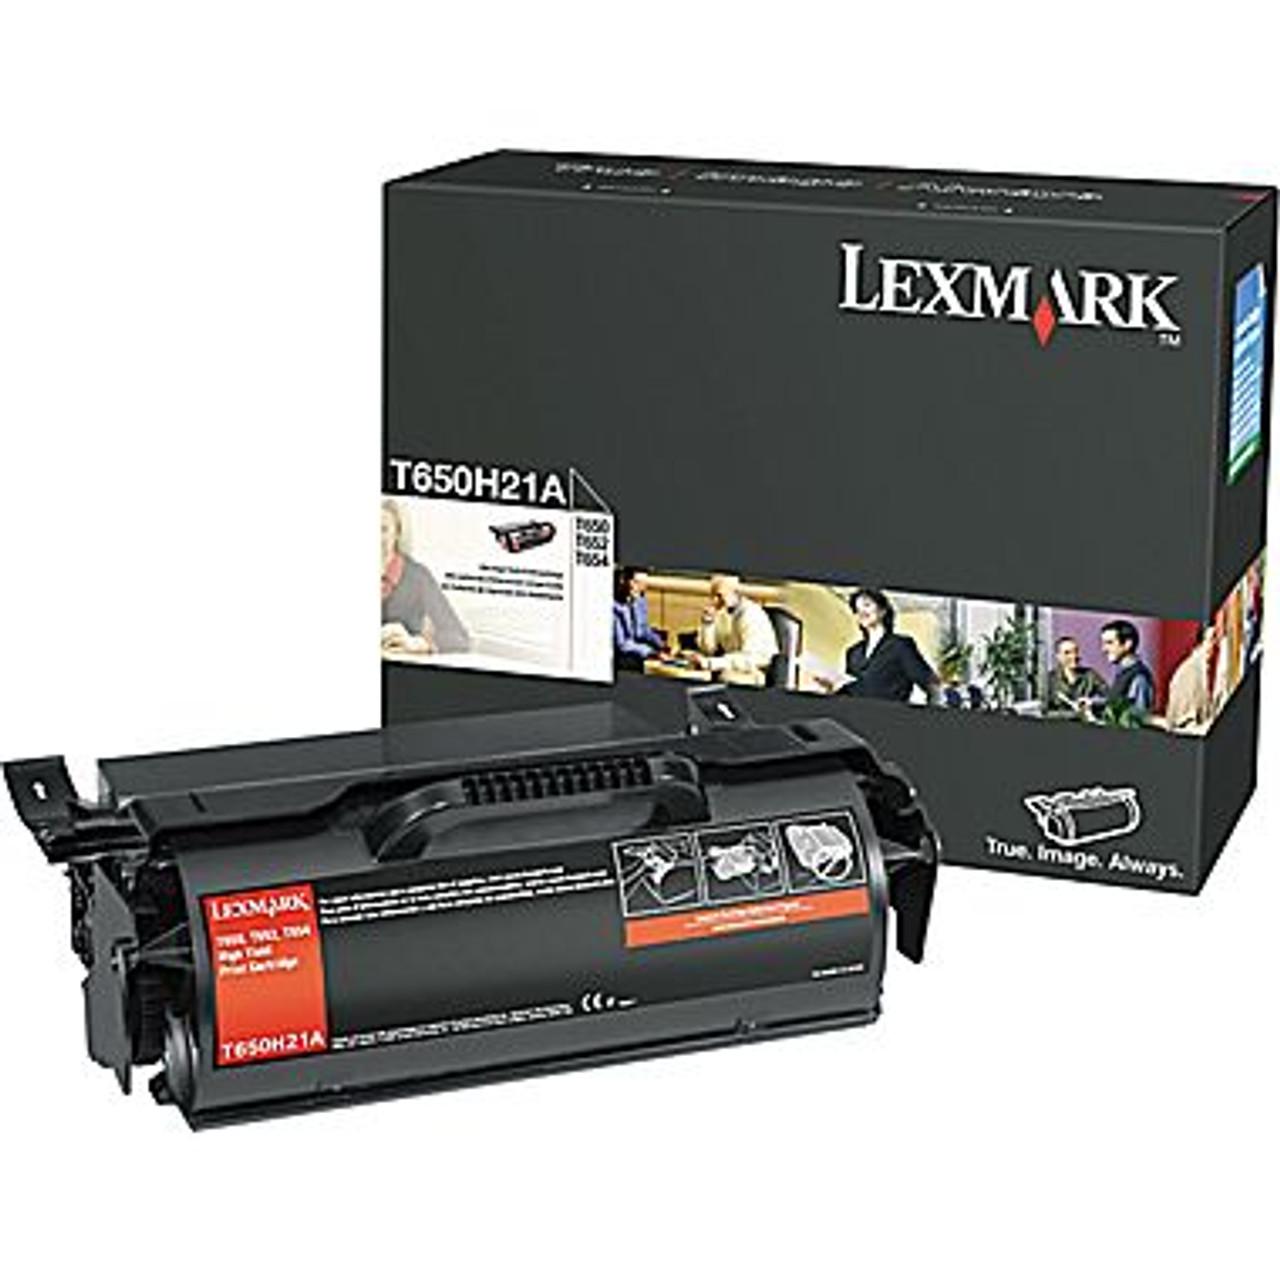 Lexmark T65X Toner Cartridge - New